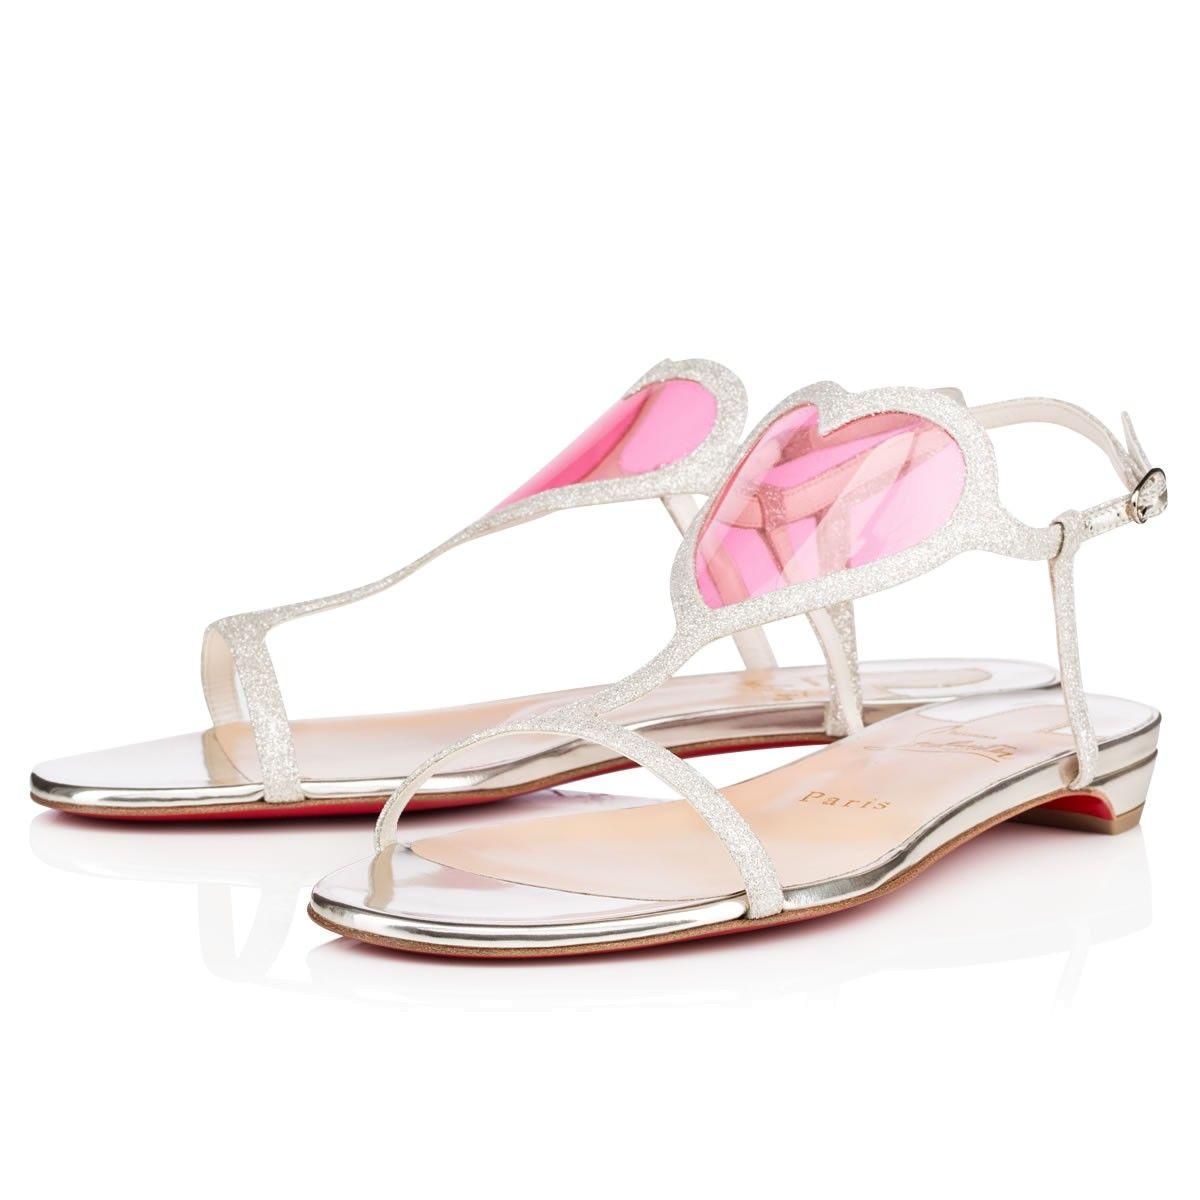 christian louboutin heart sandals